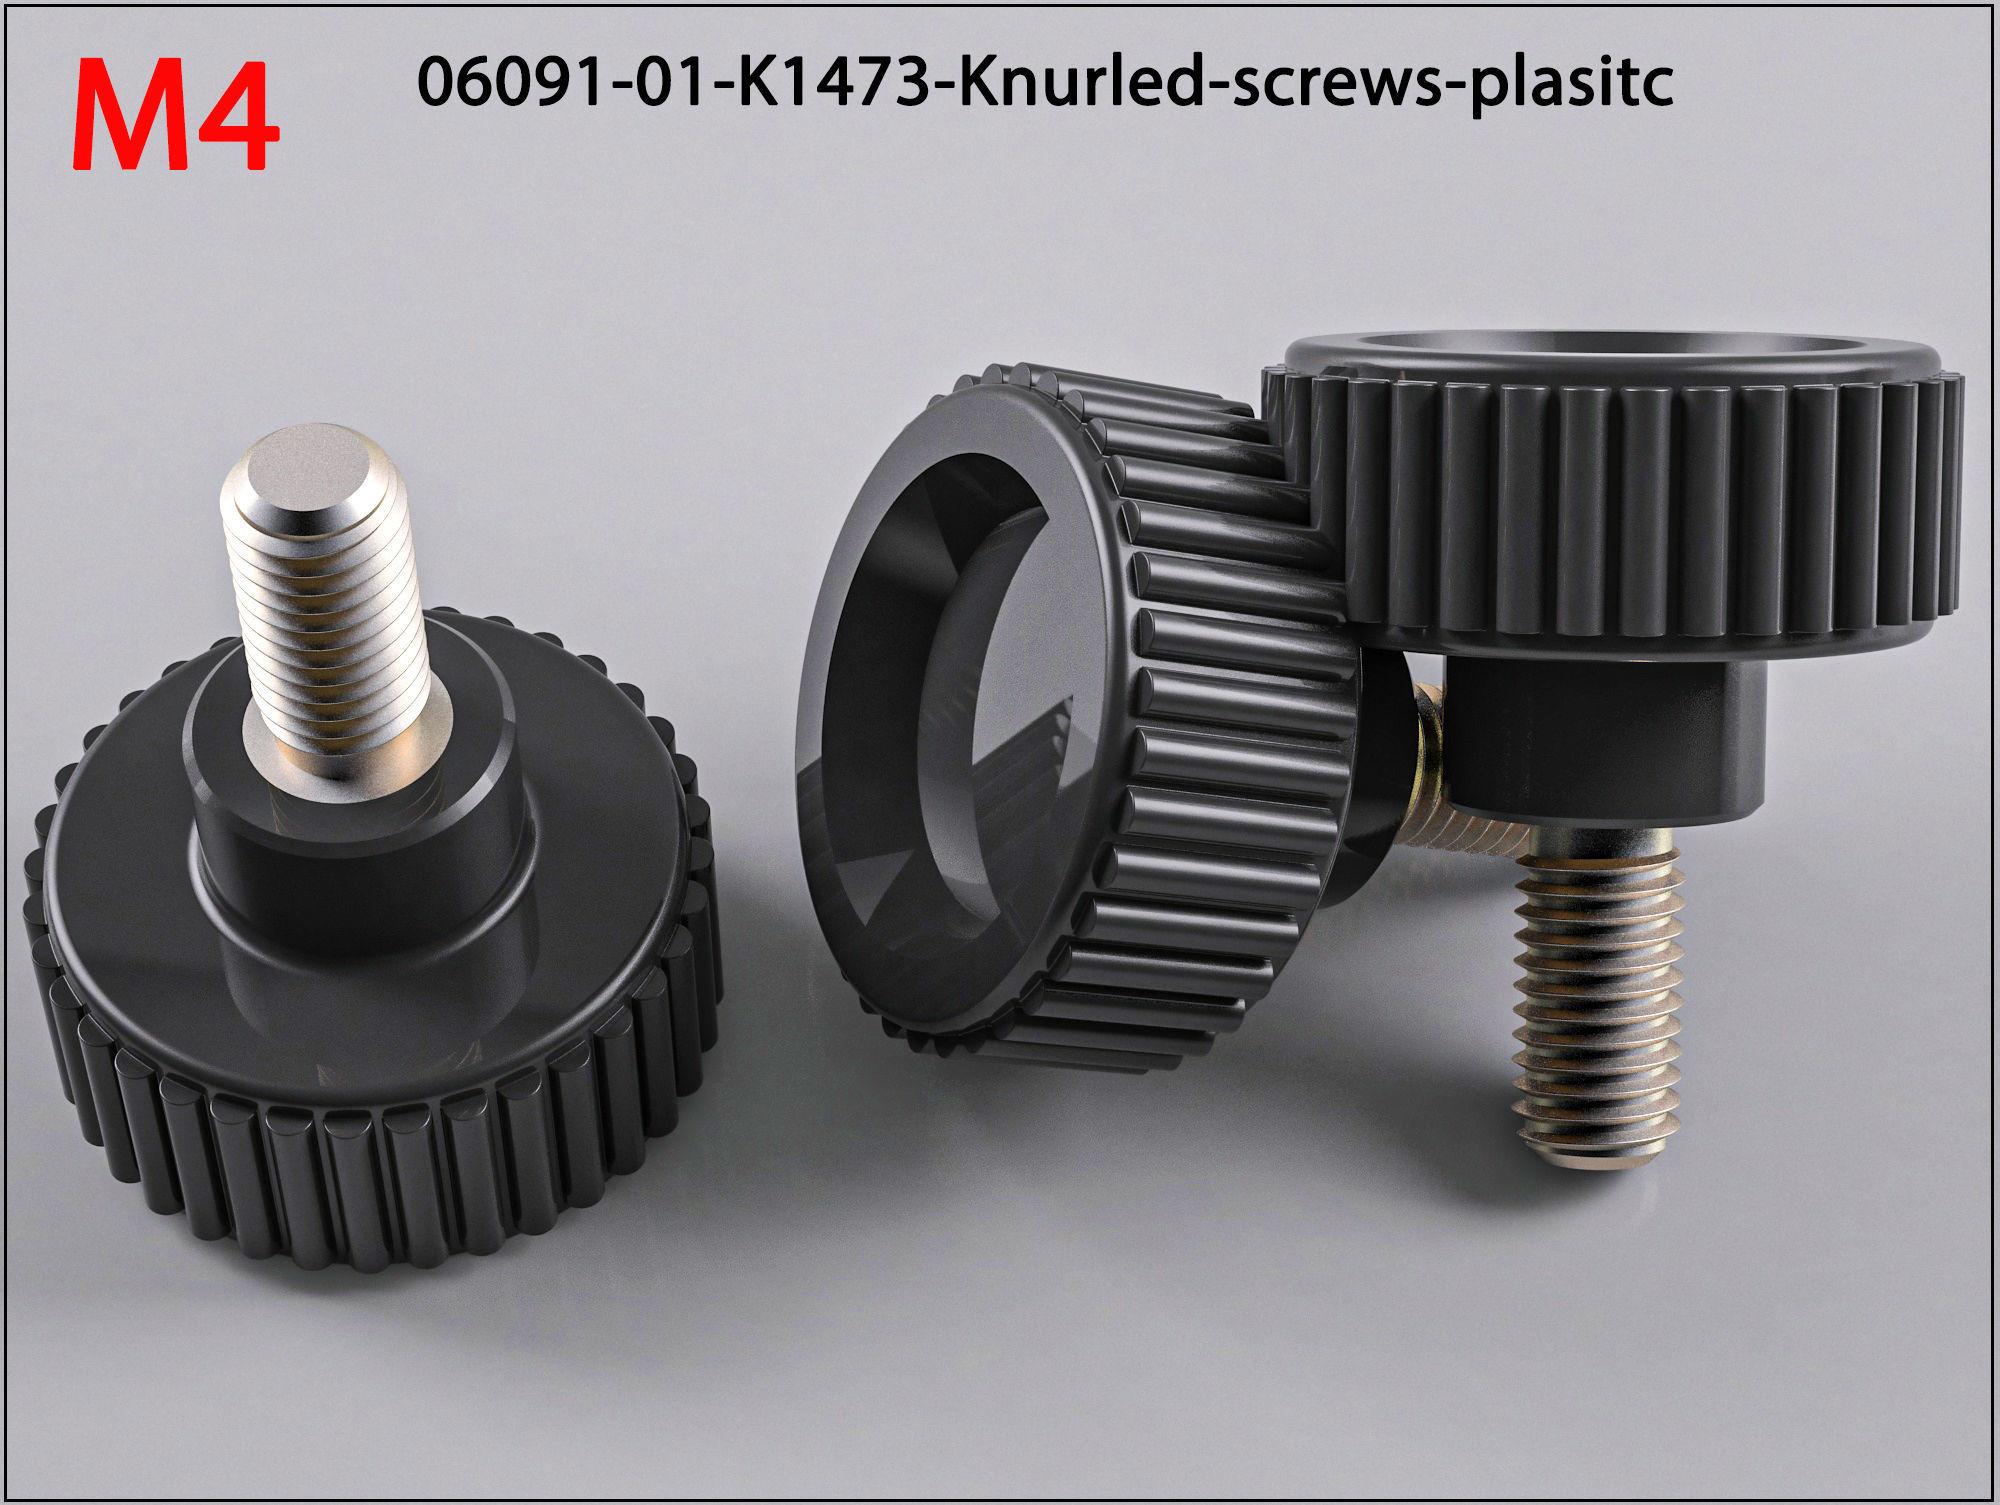 M4 Raendelschrauben-Kunststoff-Knurled-screws-plasitc